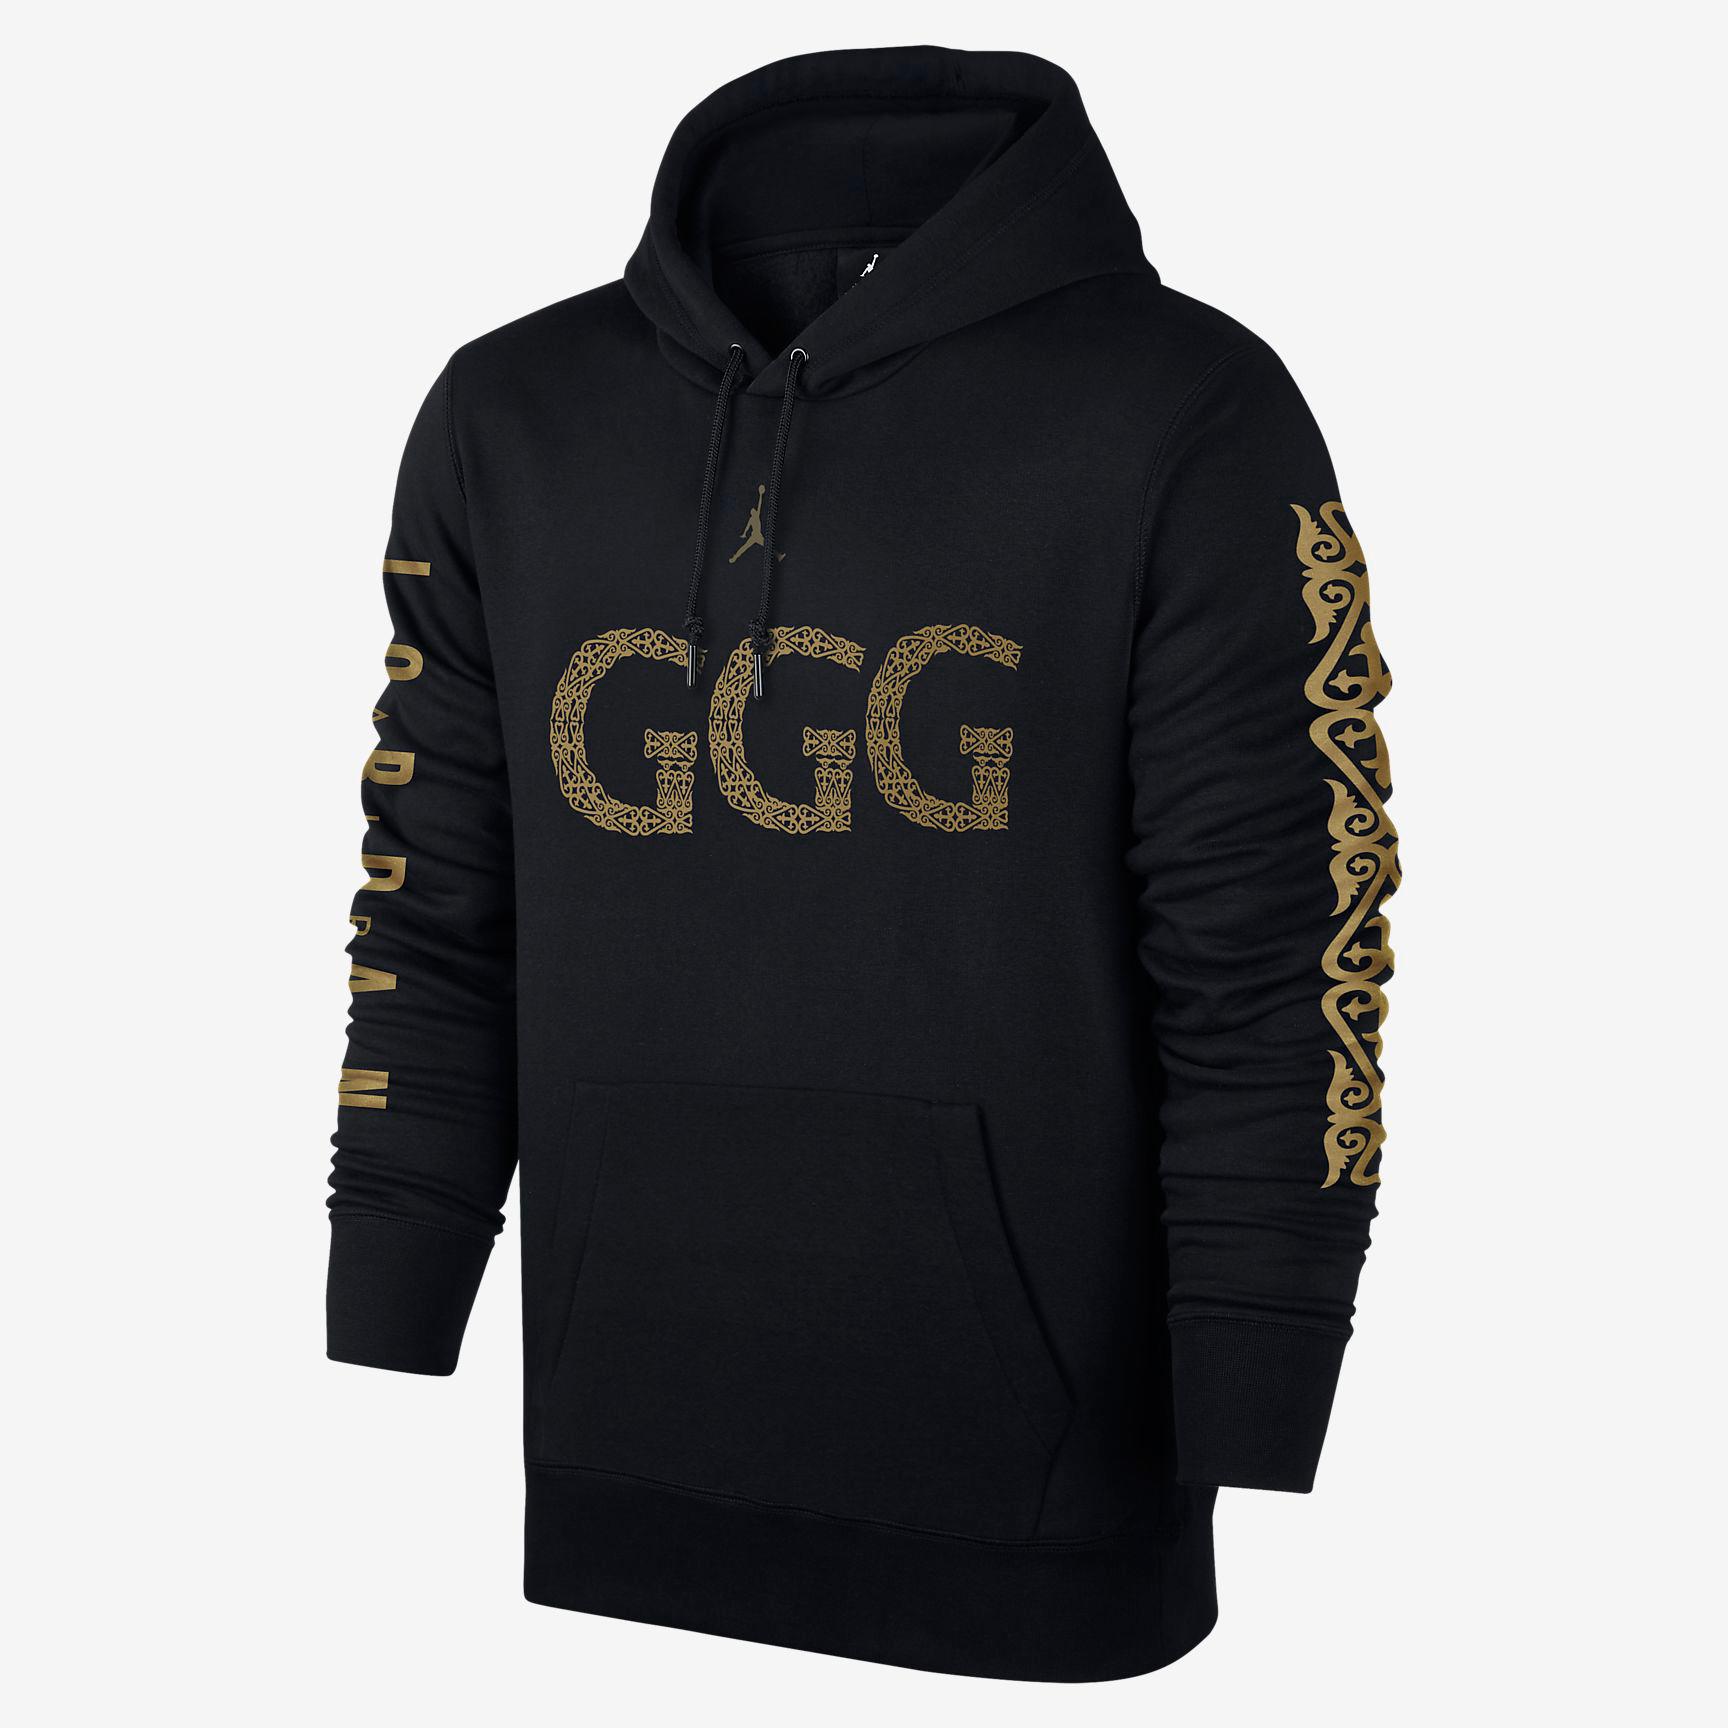 ggg nike hoodie review 43f35 2191c